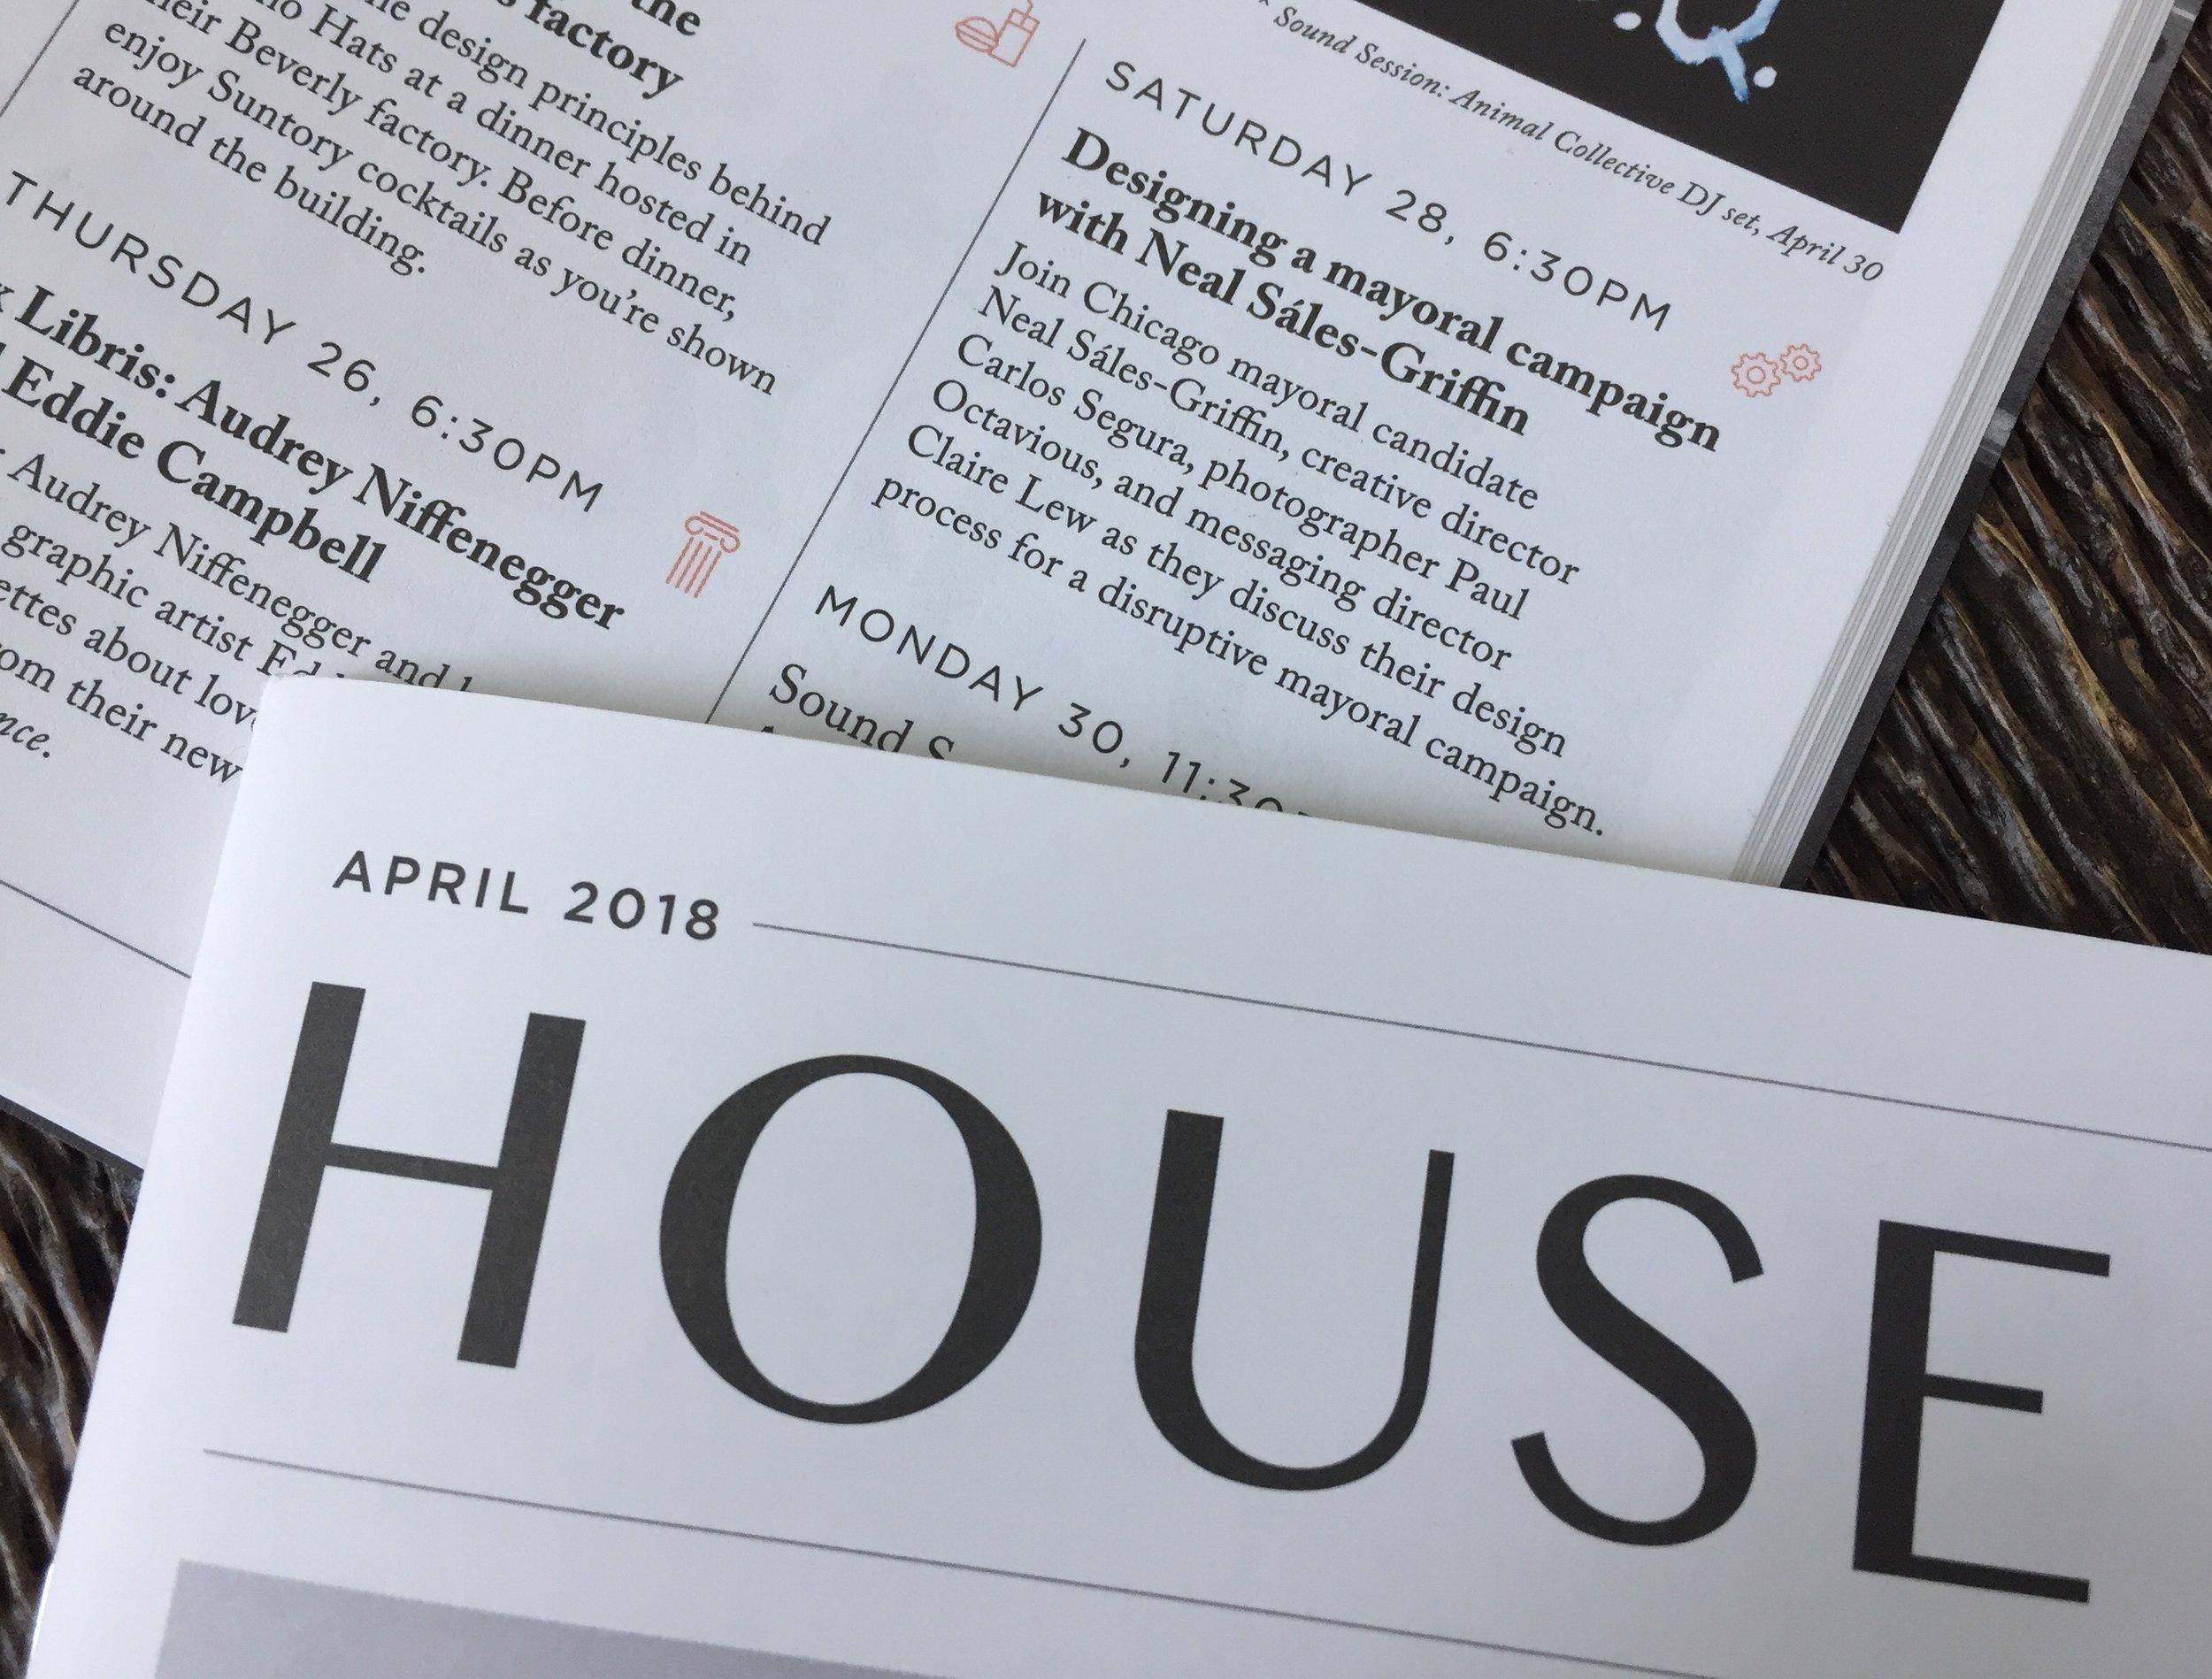 house-notes.jpg